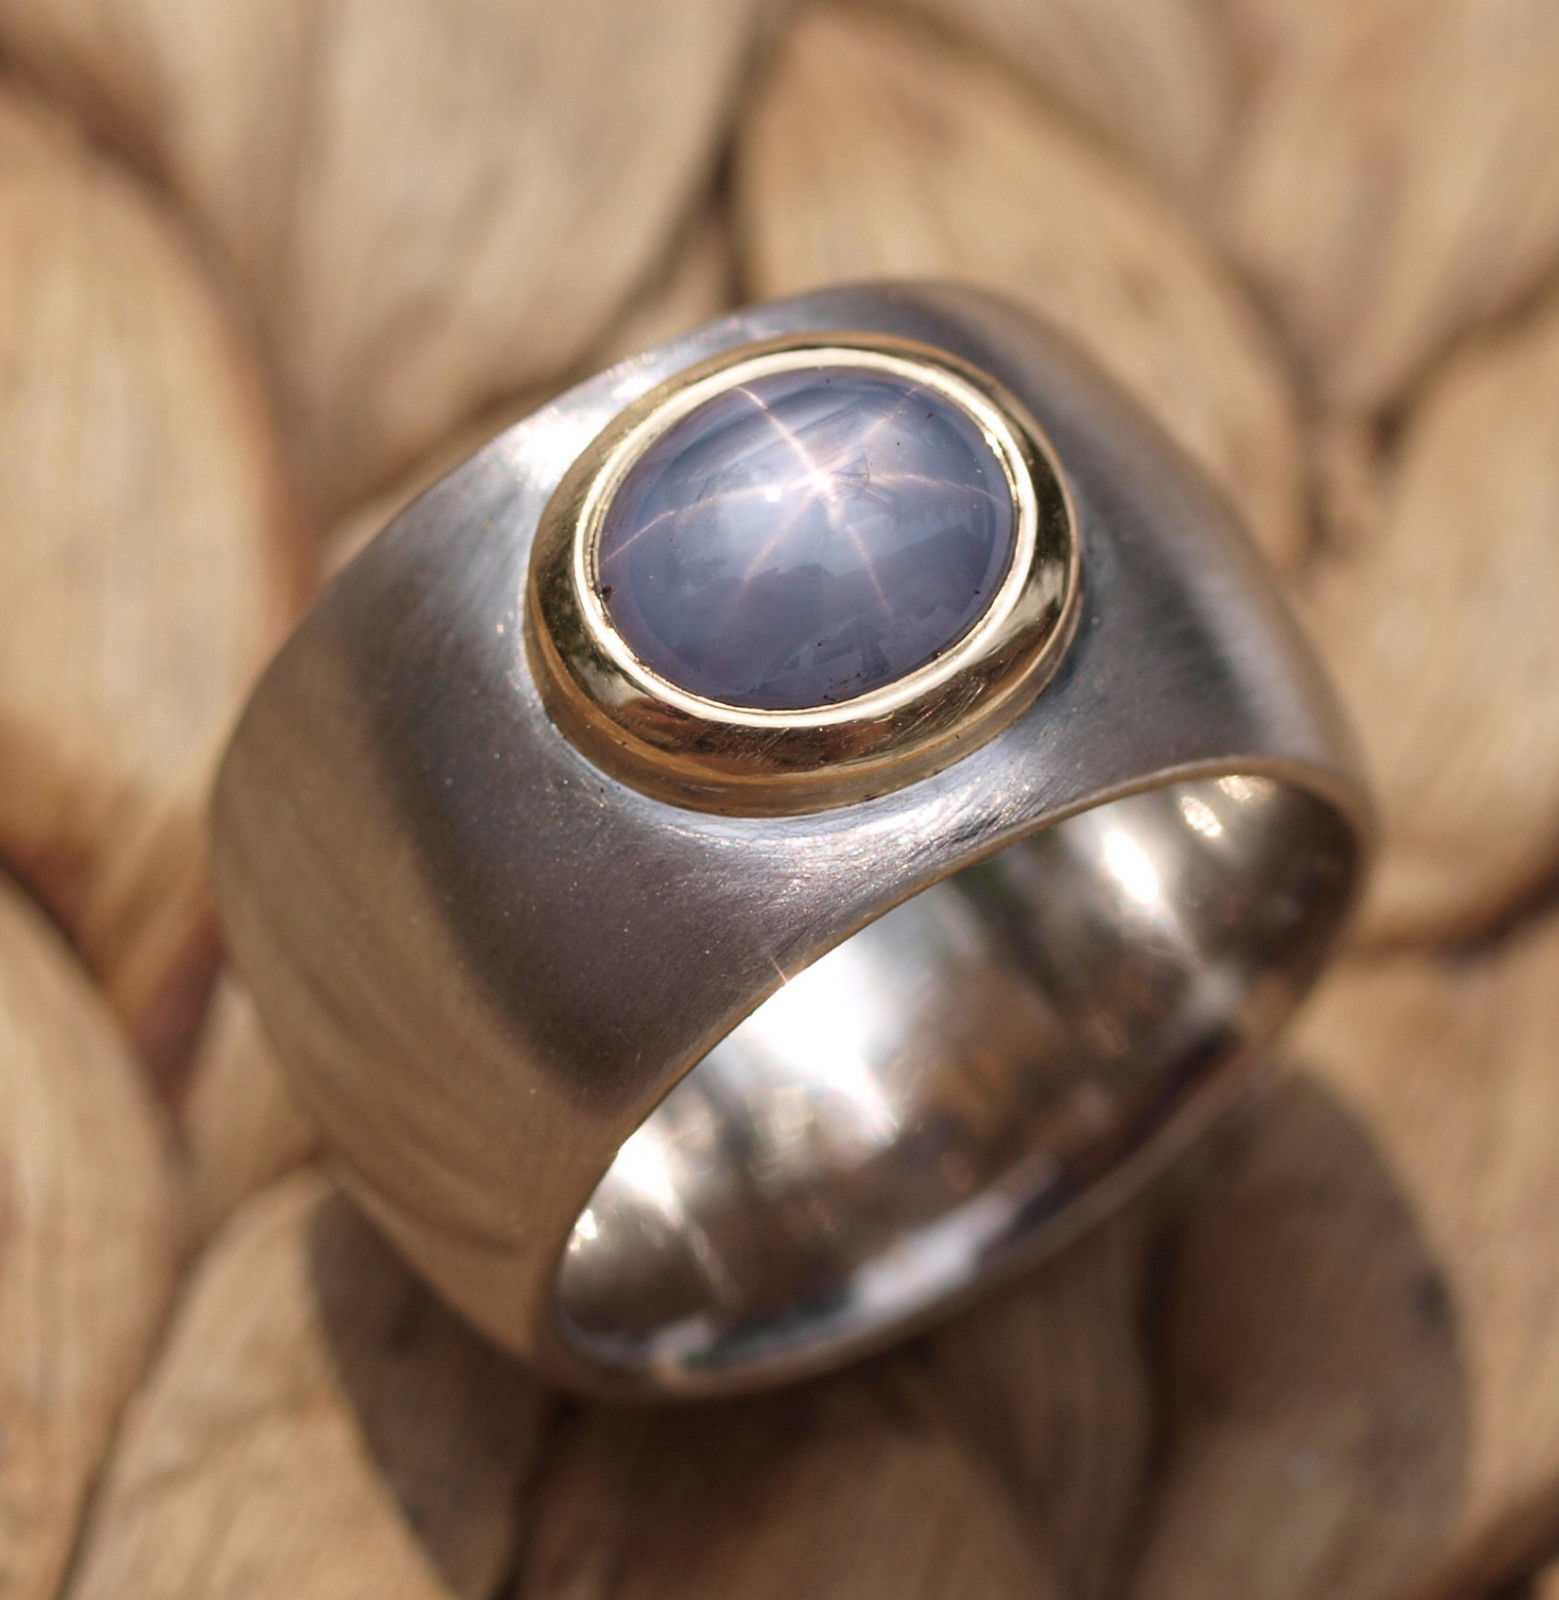 Ring Platin 950 Gold 750 Stern - Saphir Sternsaphir Ceylon 2,7 ct Unikat